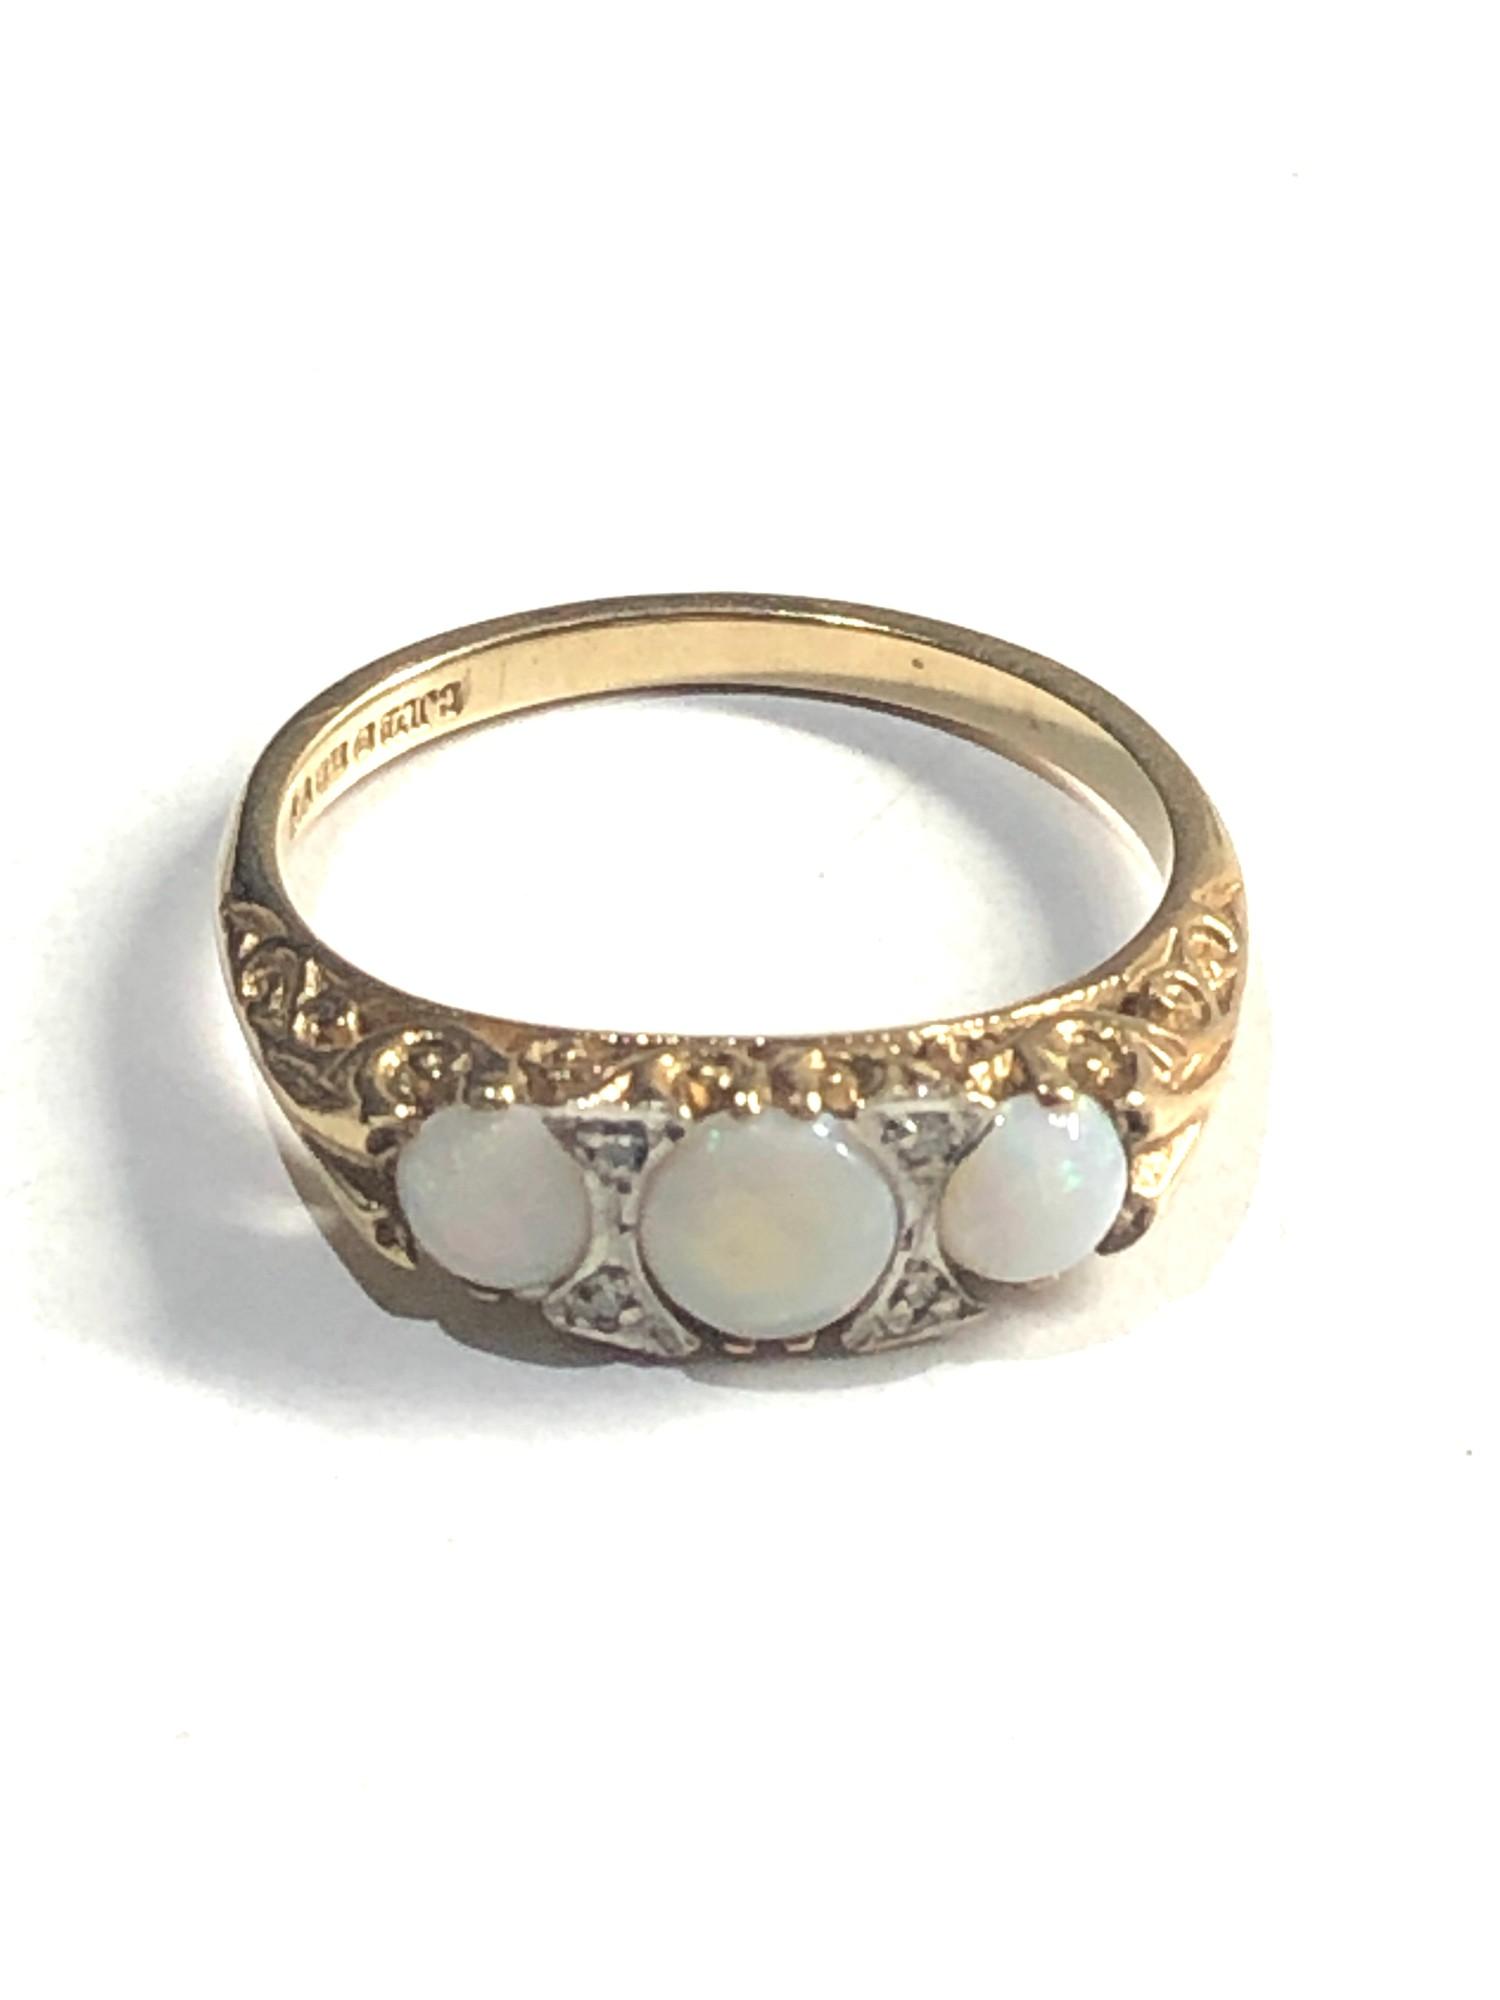 Vintage 9ct Gold opal & diamond detail ring 2.6G